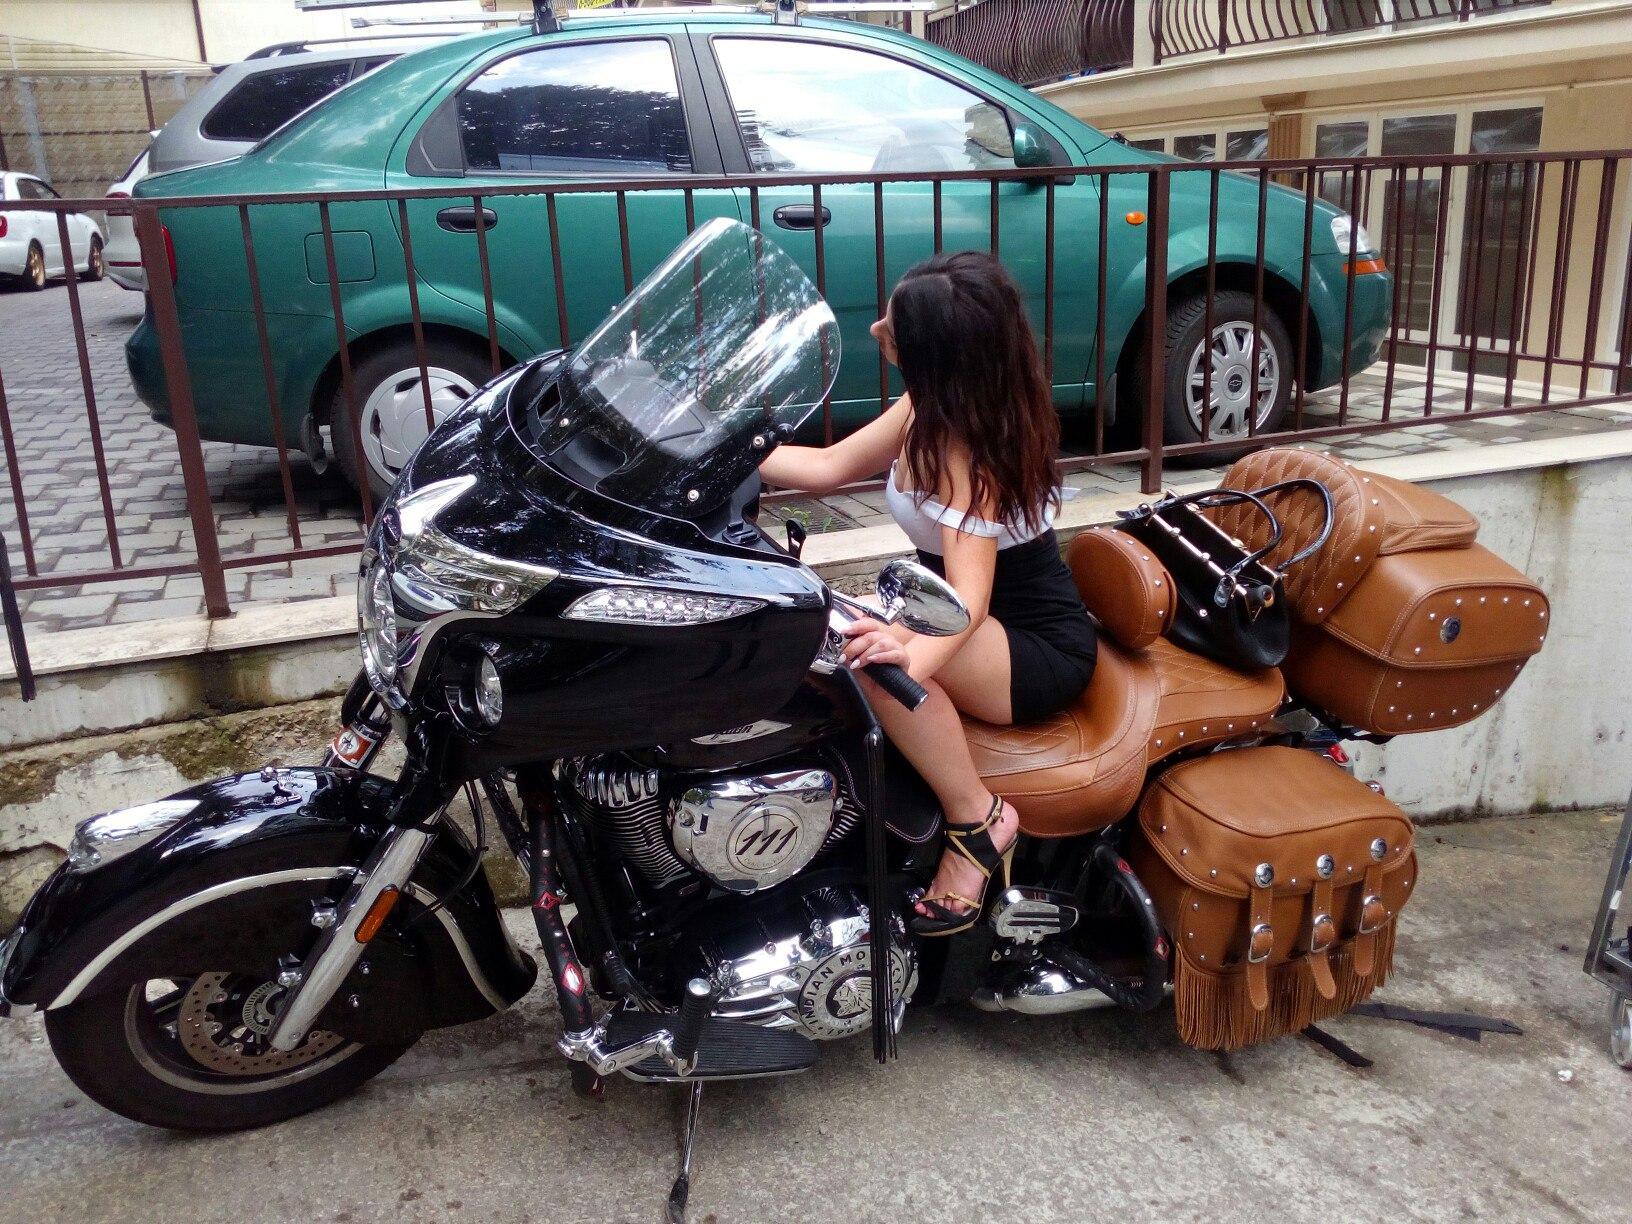 seks-na-mototsikle-igri